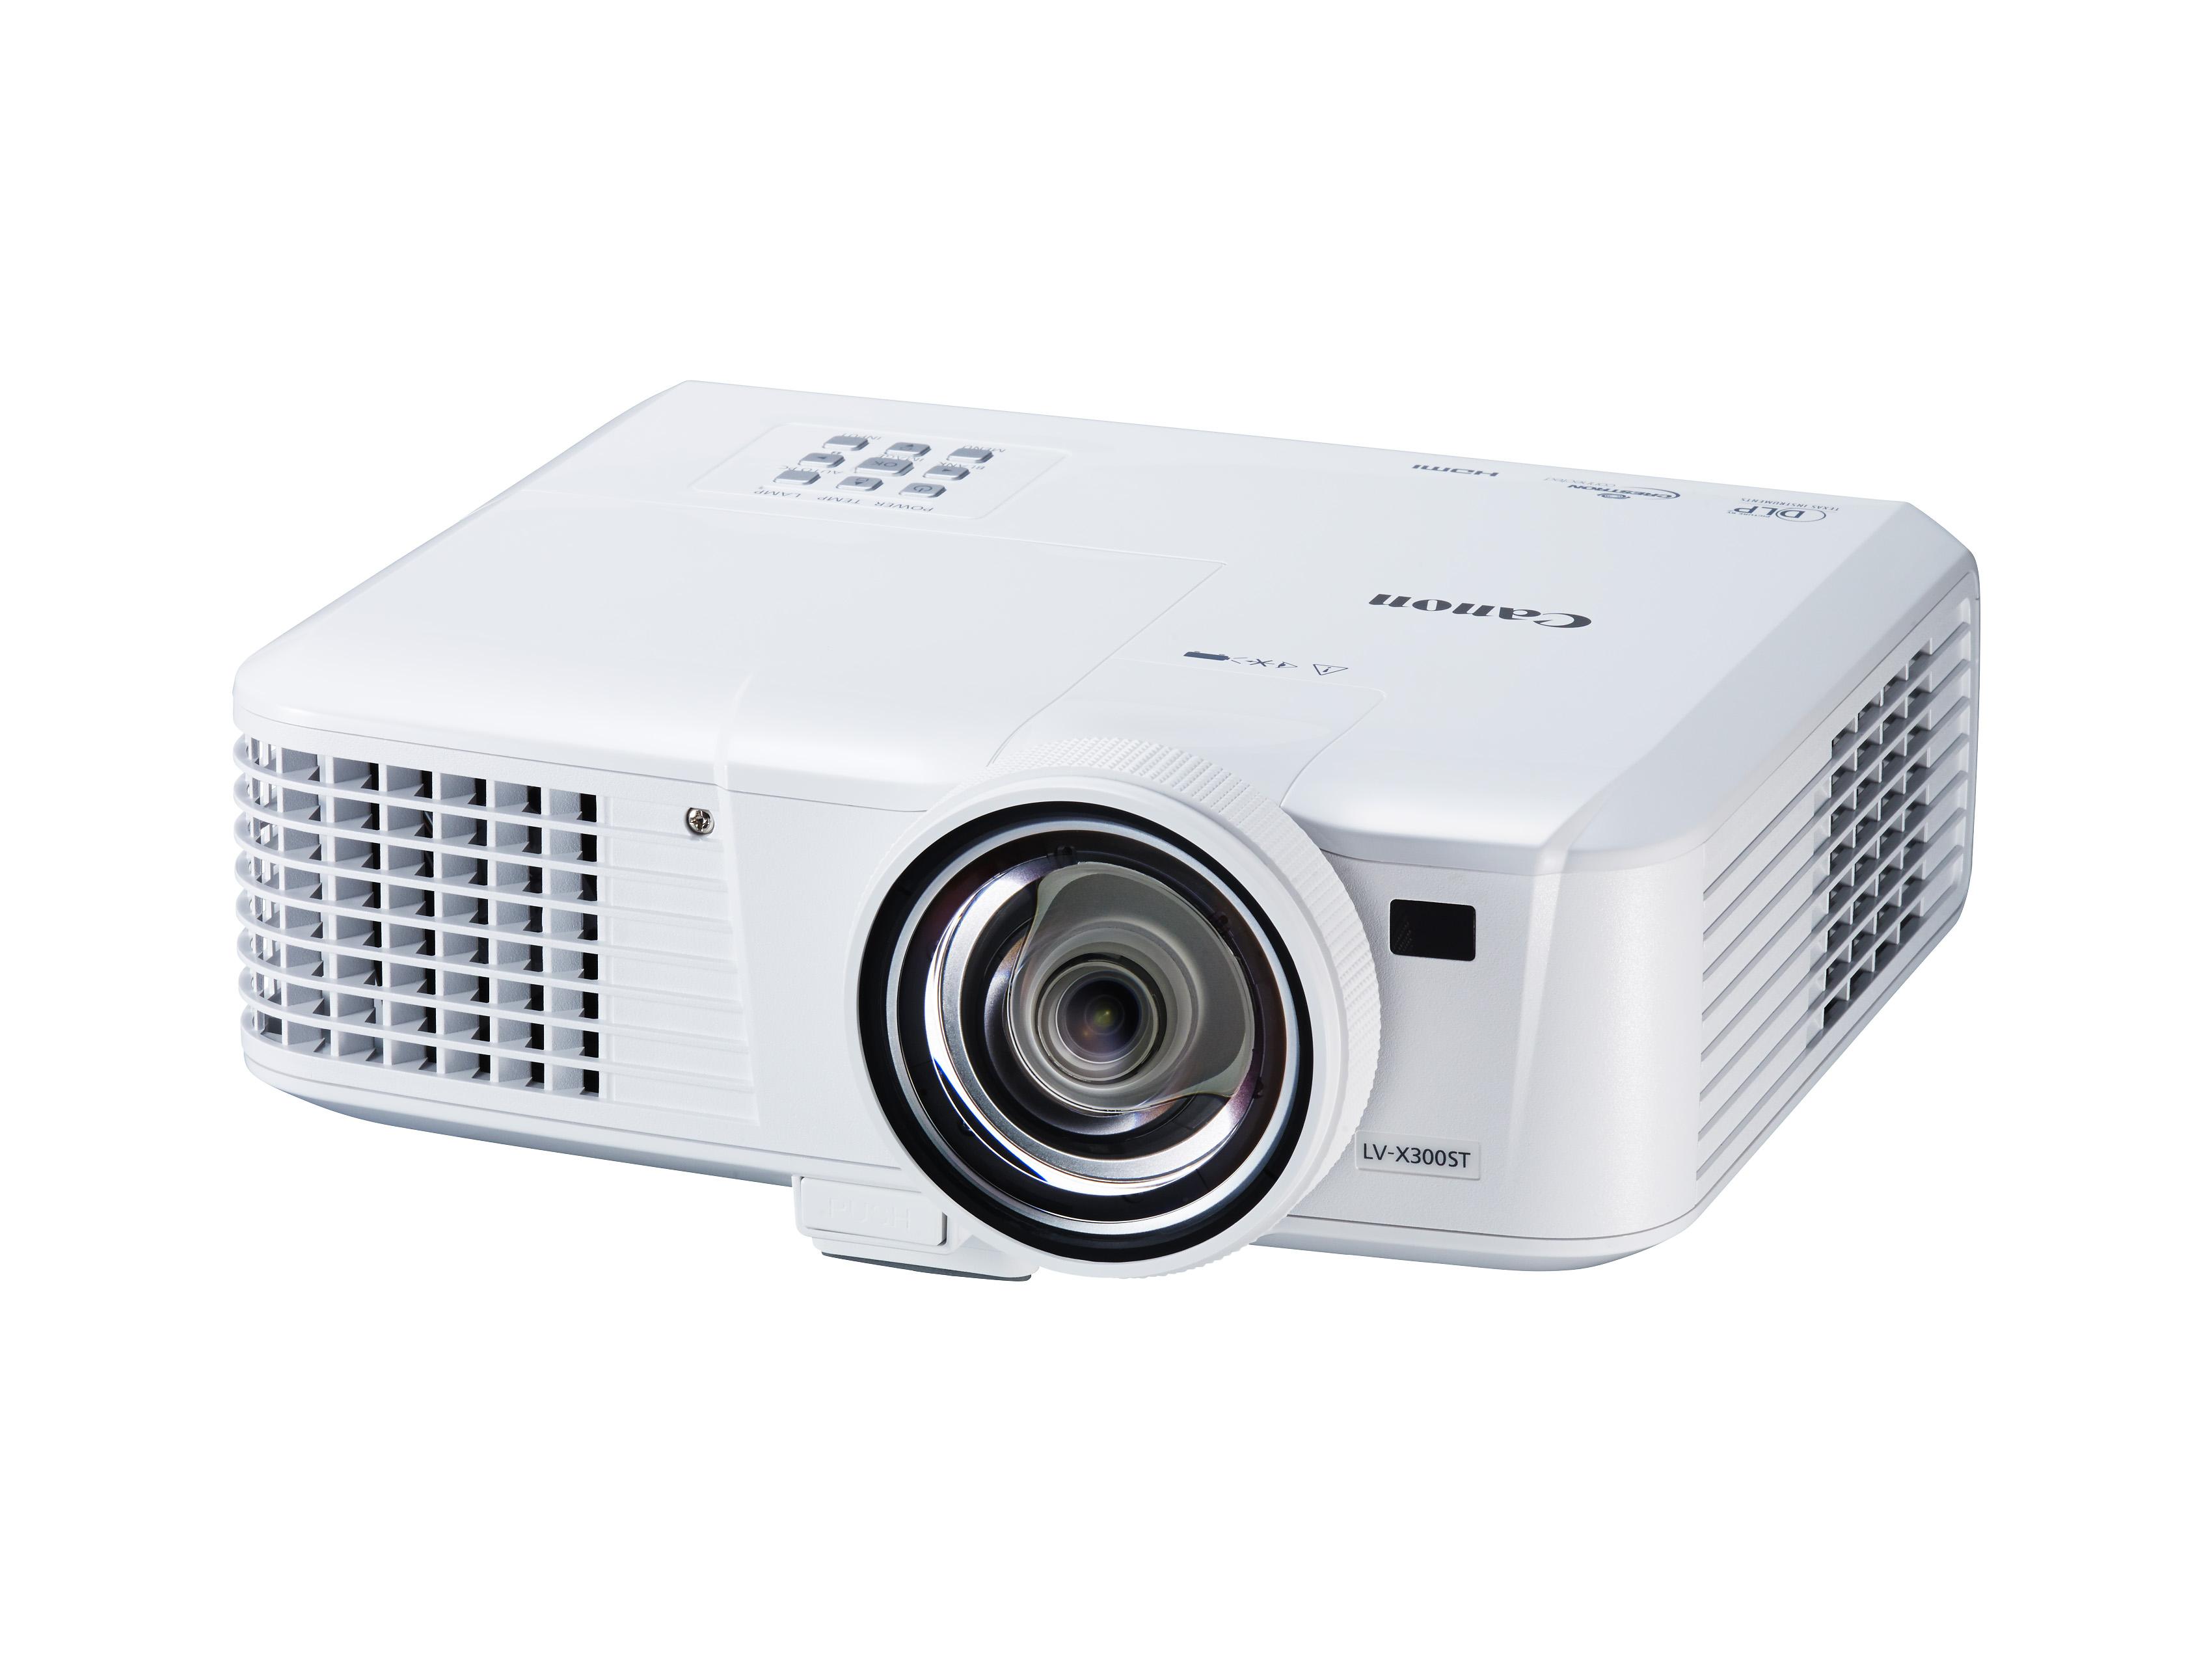 Canon Projektoren Lv X300st Xga Dlp Beamer Hitachi Cp X4041wn Wifi Projector Projektor